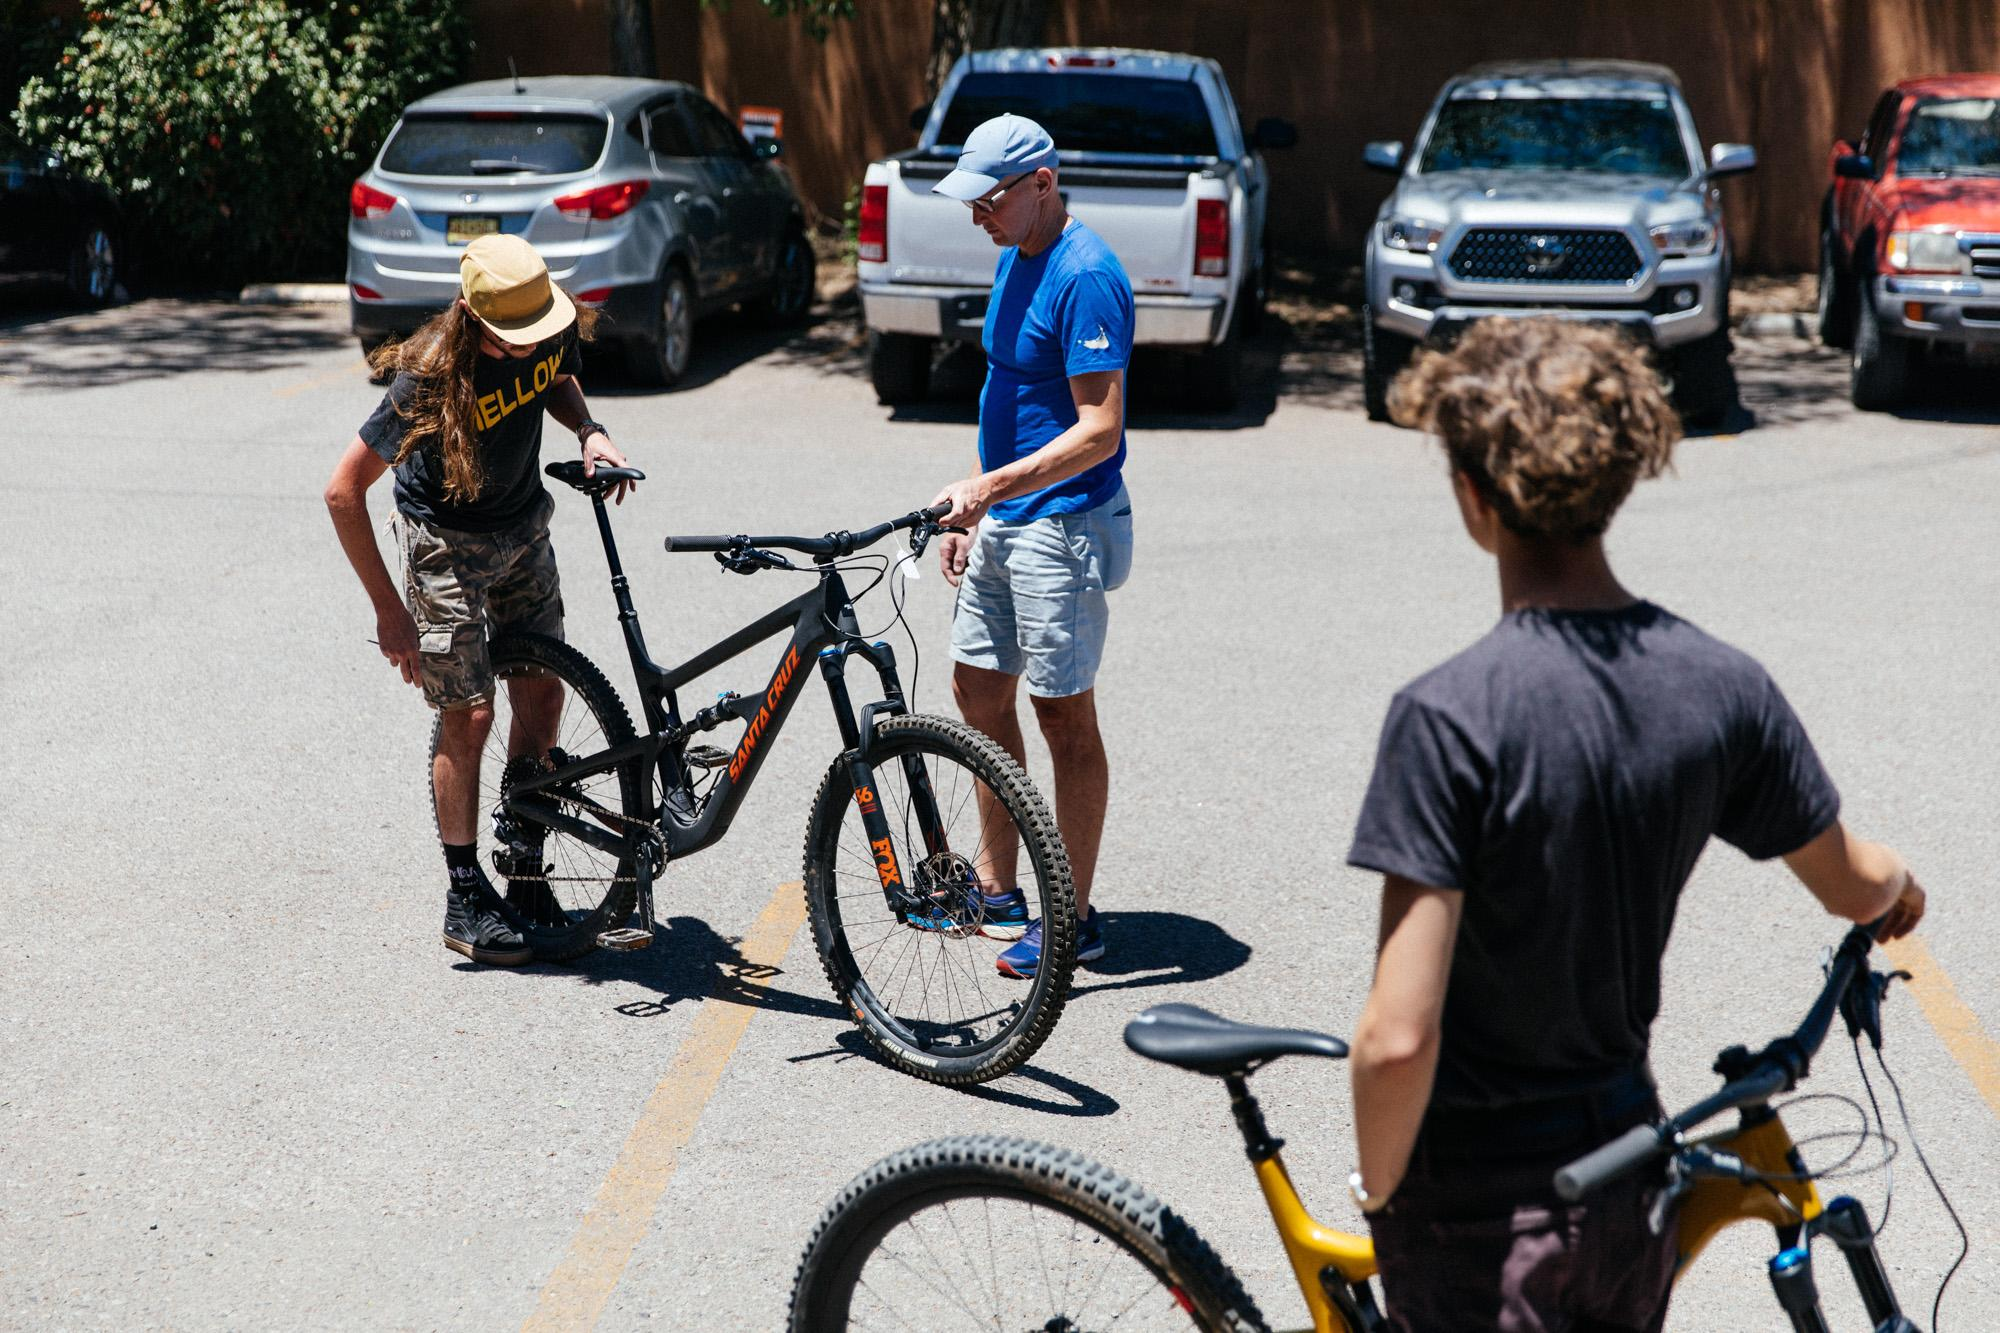 Customer trying out some Santa Cruz bikes.